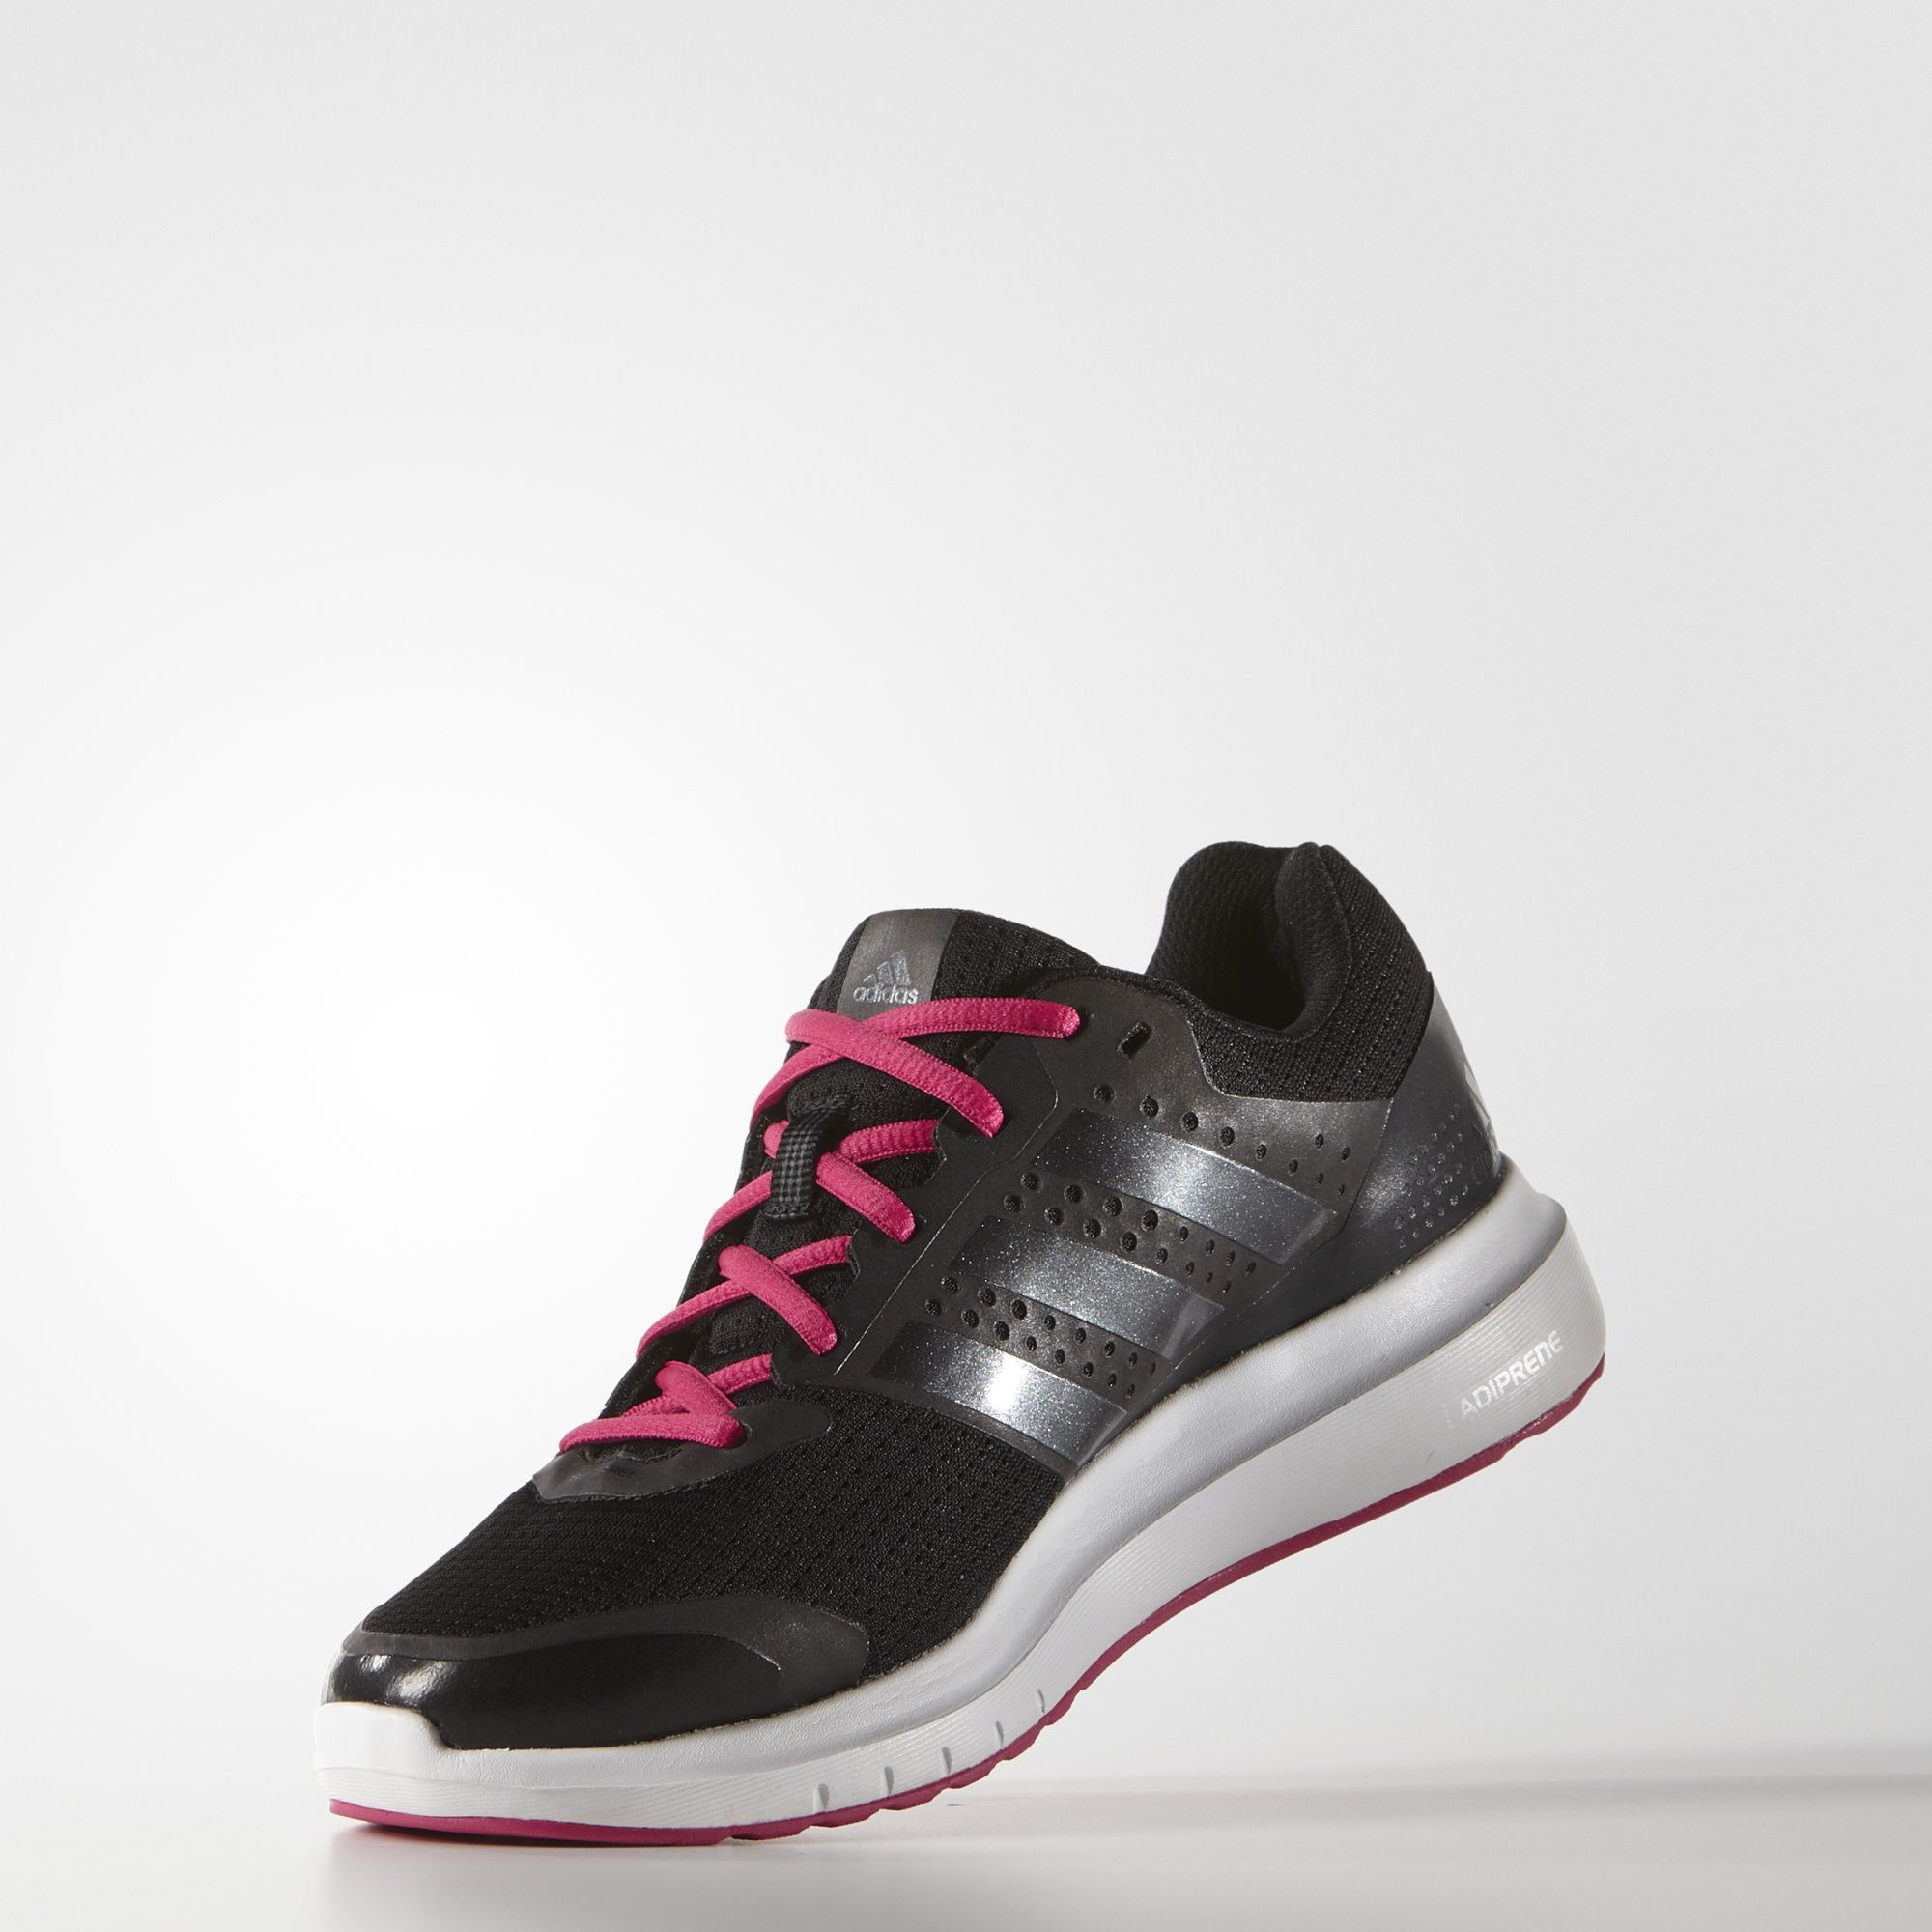 lowest price 18df1 99aa4 Adidas Duramo 7 Womens Shoes Core Black Night Metallic Bold Pink B33562